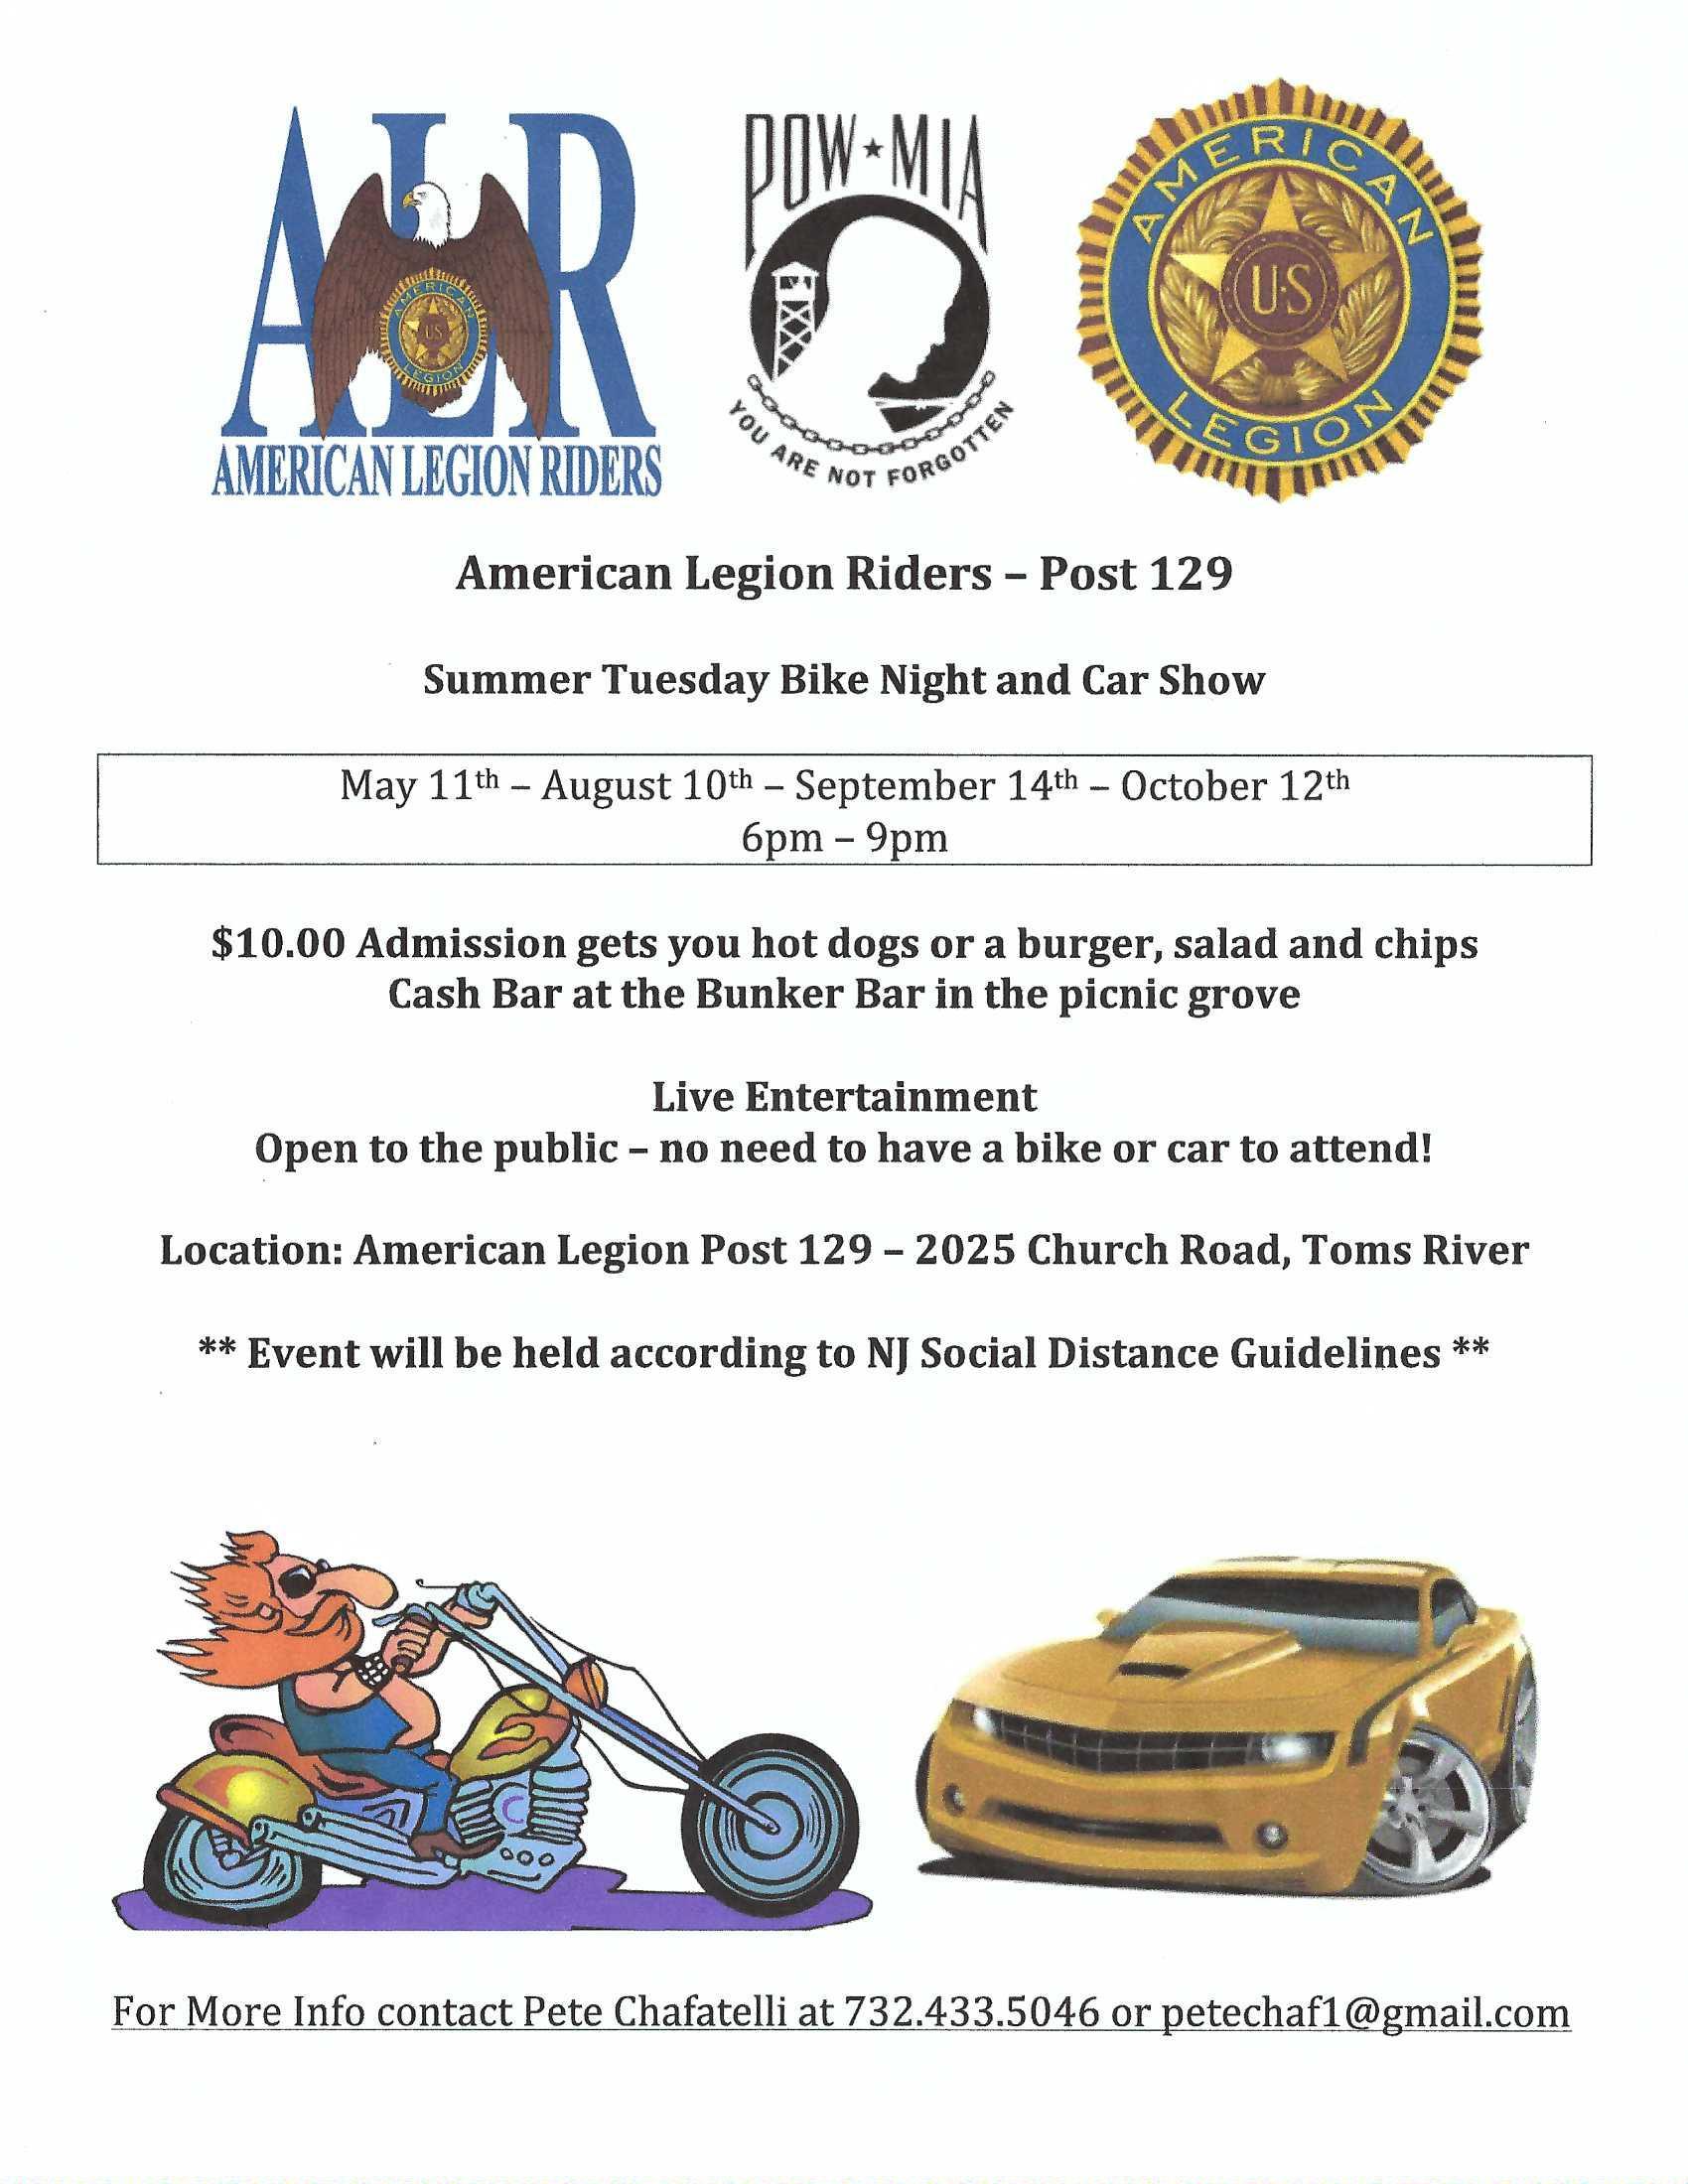 ALR Summer Tue Bike Night - American Legion Riders Post 129 Summer Tuesday Bike Night and Car Show